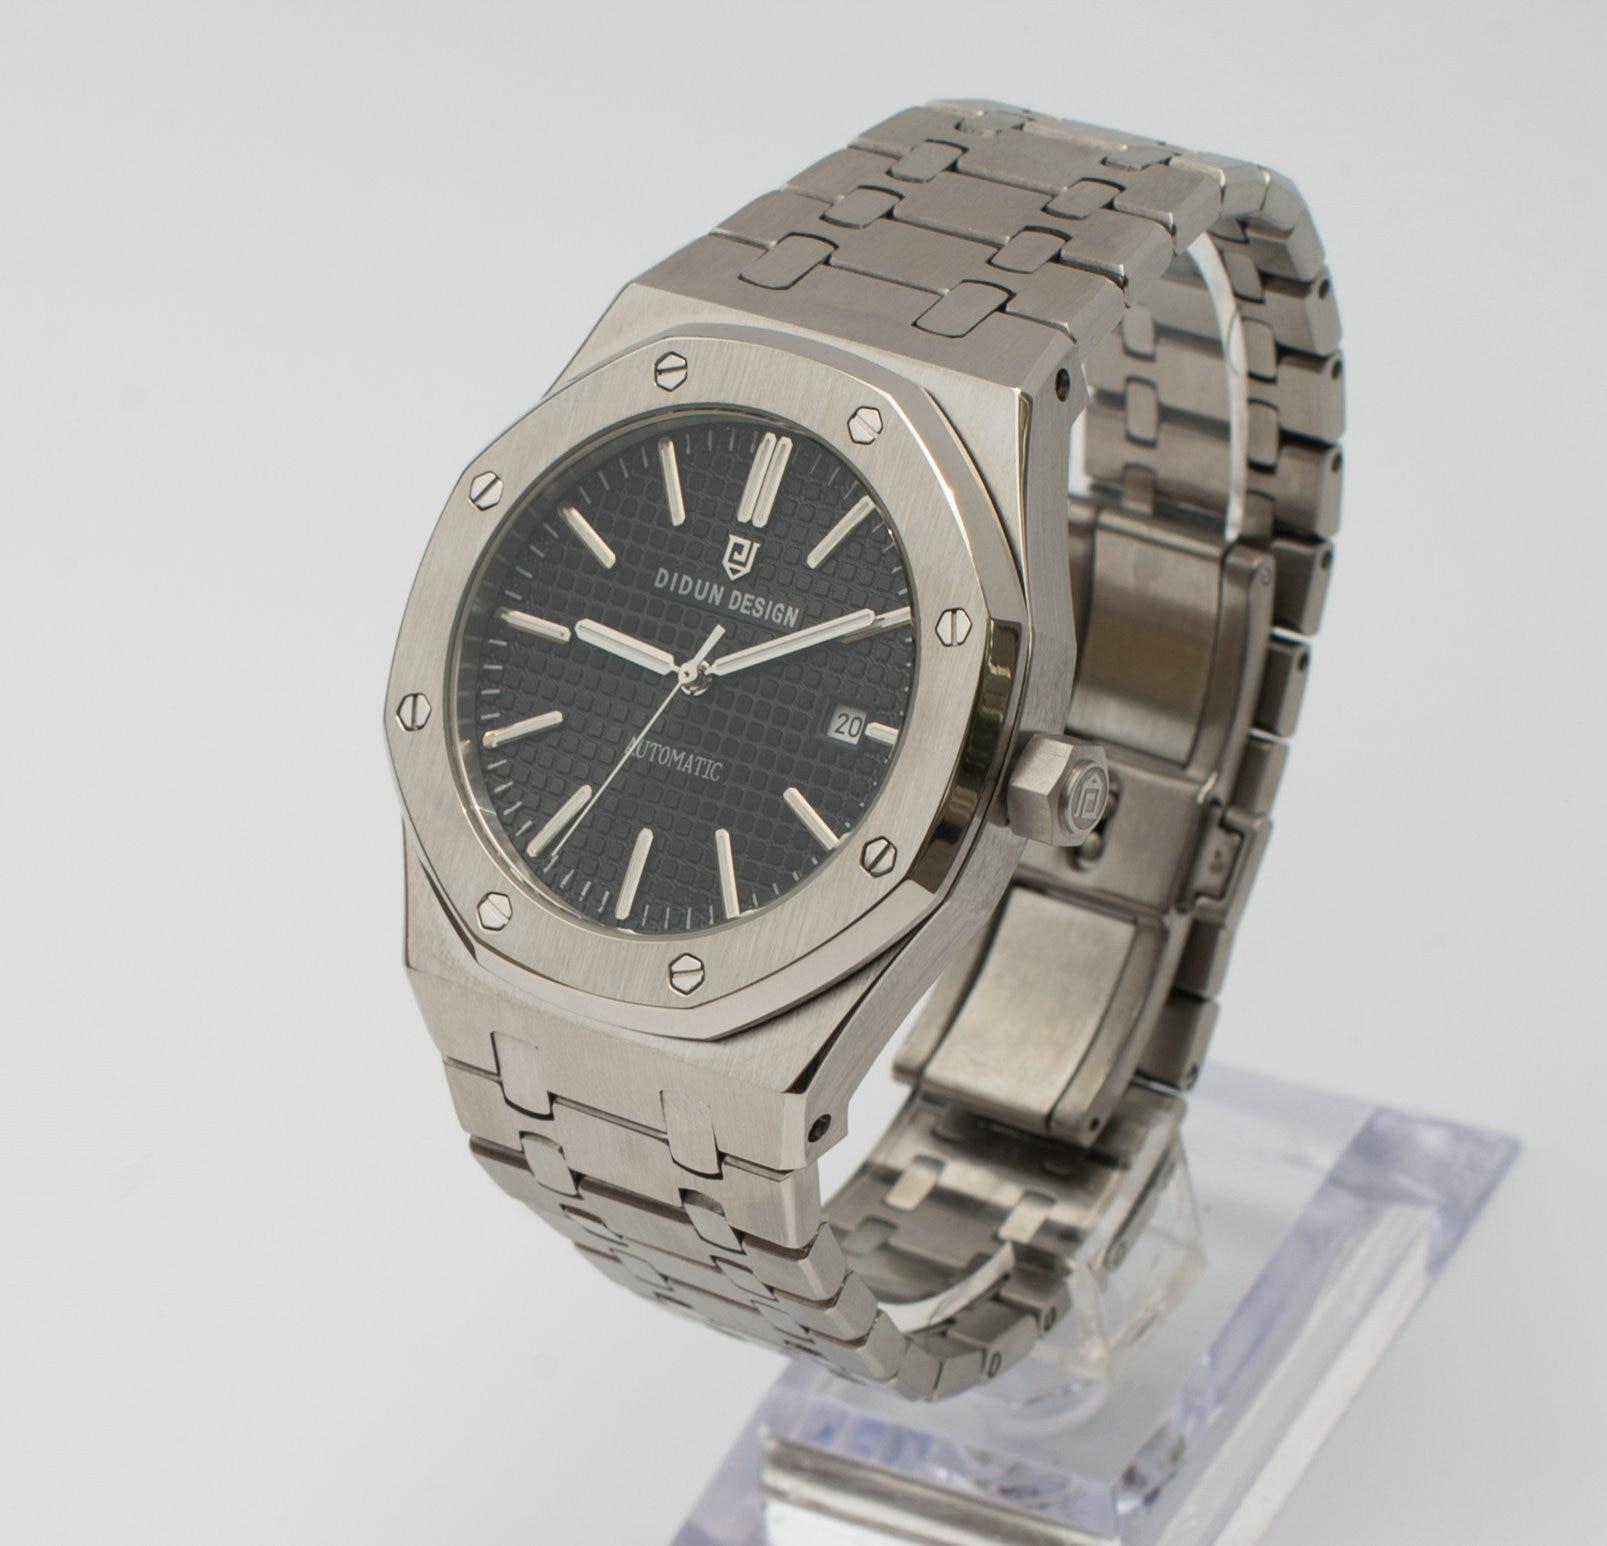 didun Watch men Luxury Brand Men Automatic Mechanical Watch Fashion Business Male Watch steel stainless strap